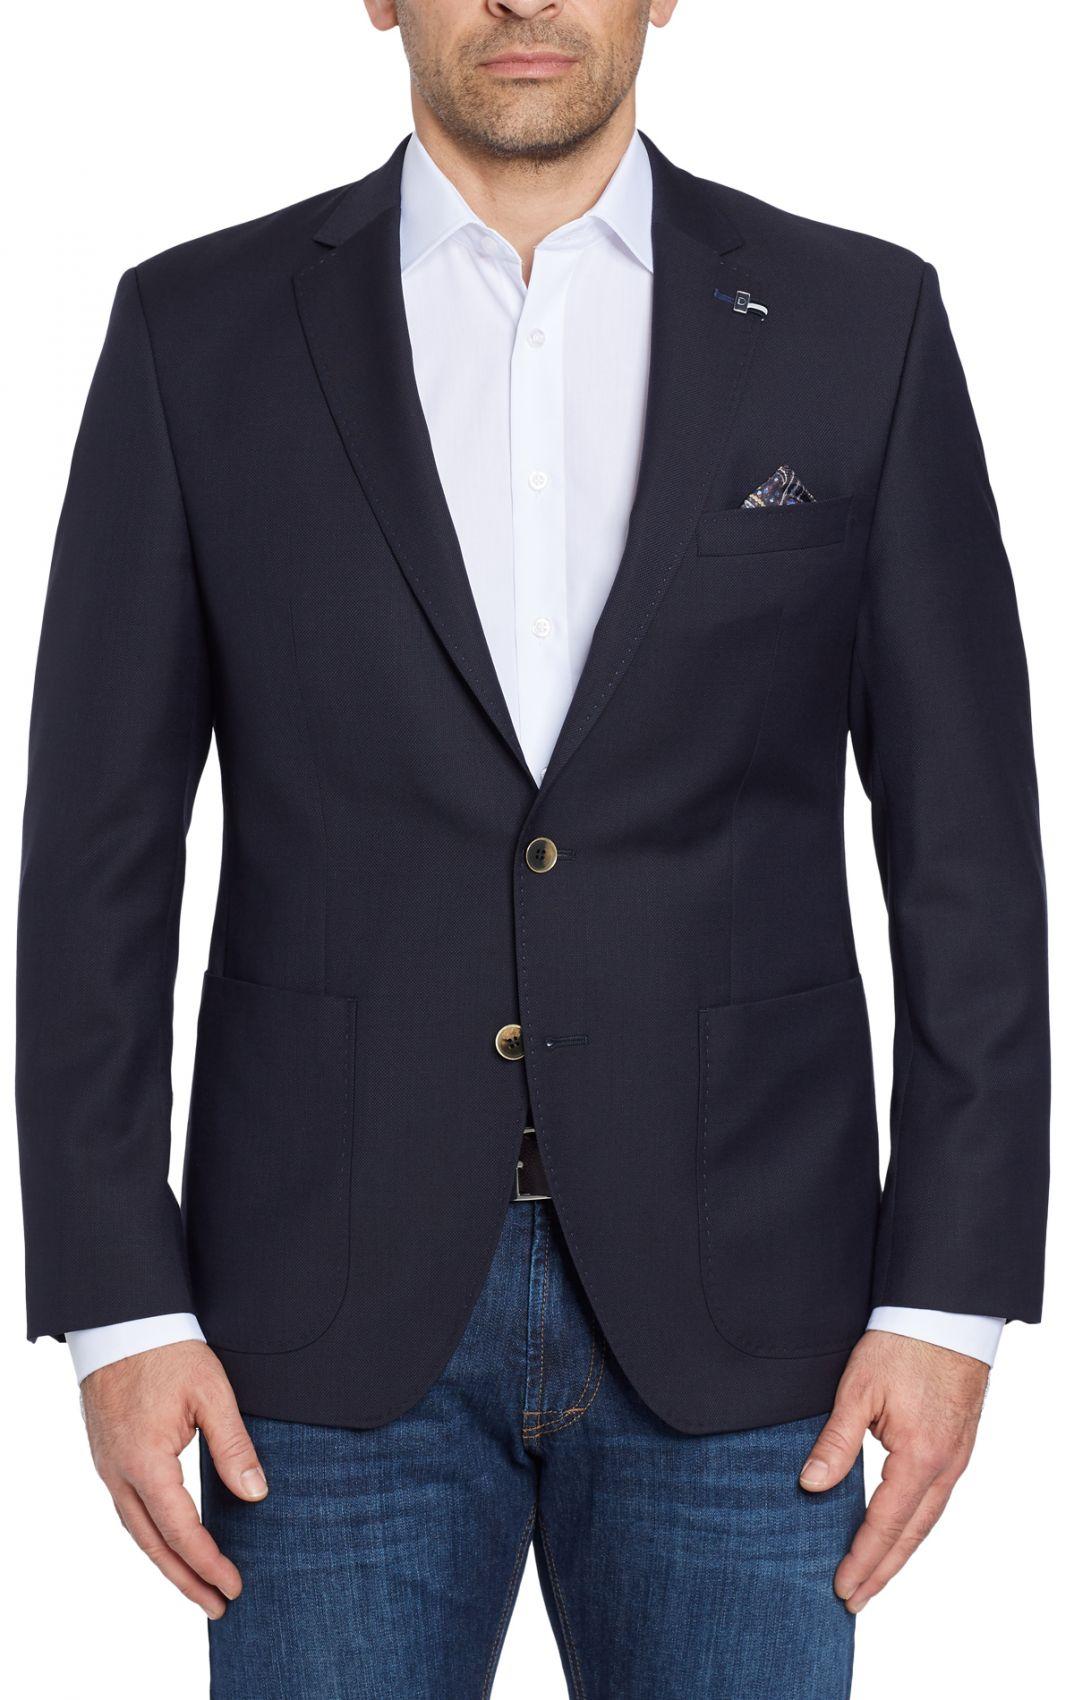 Giacca blazer classico da uomo Digel lana marzotto drop sei